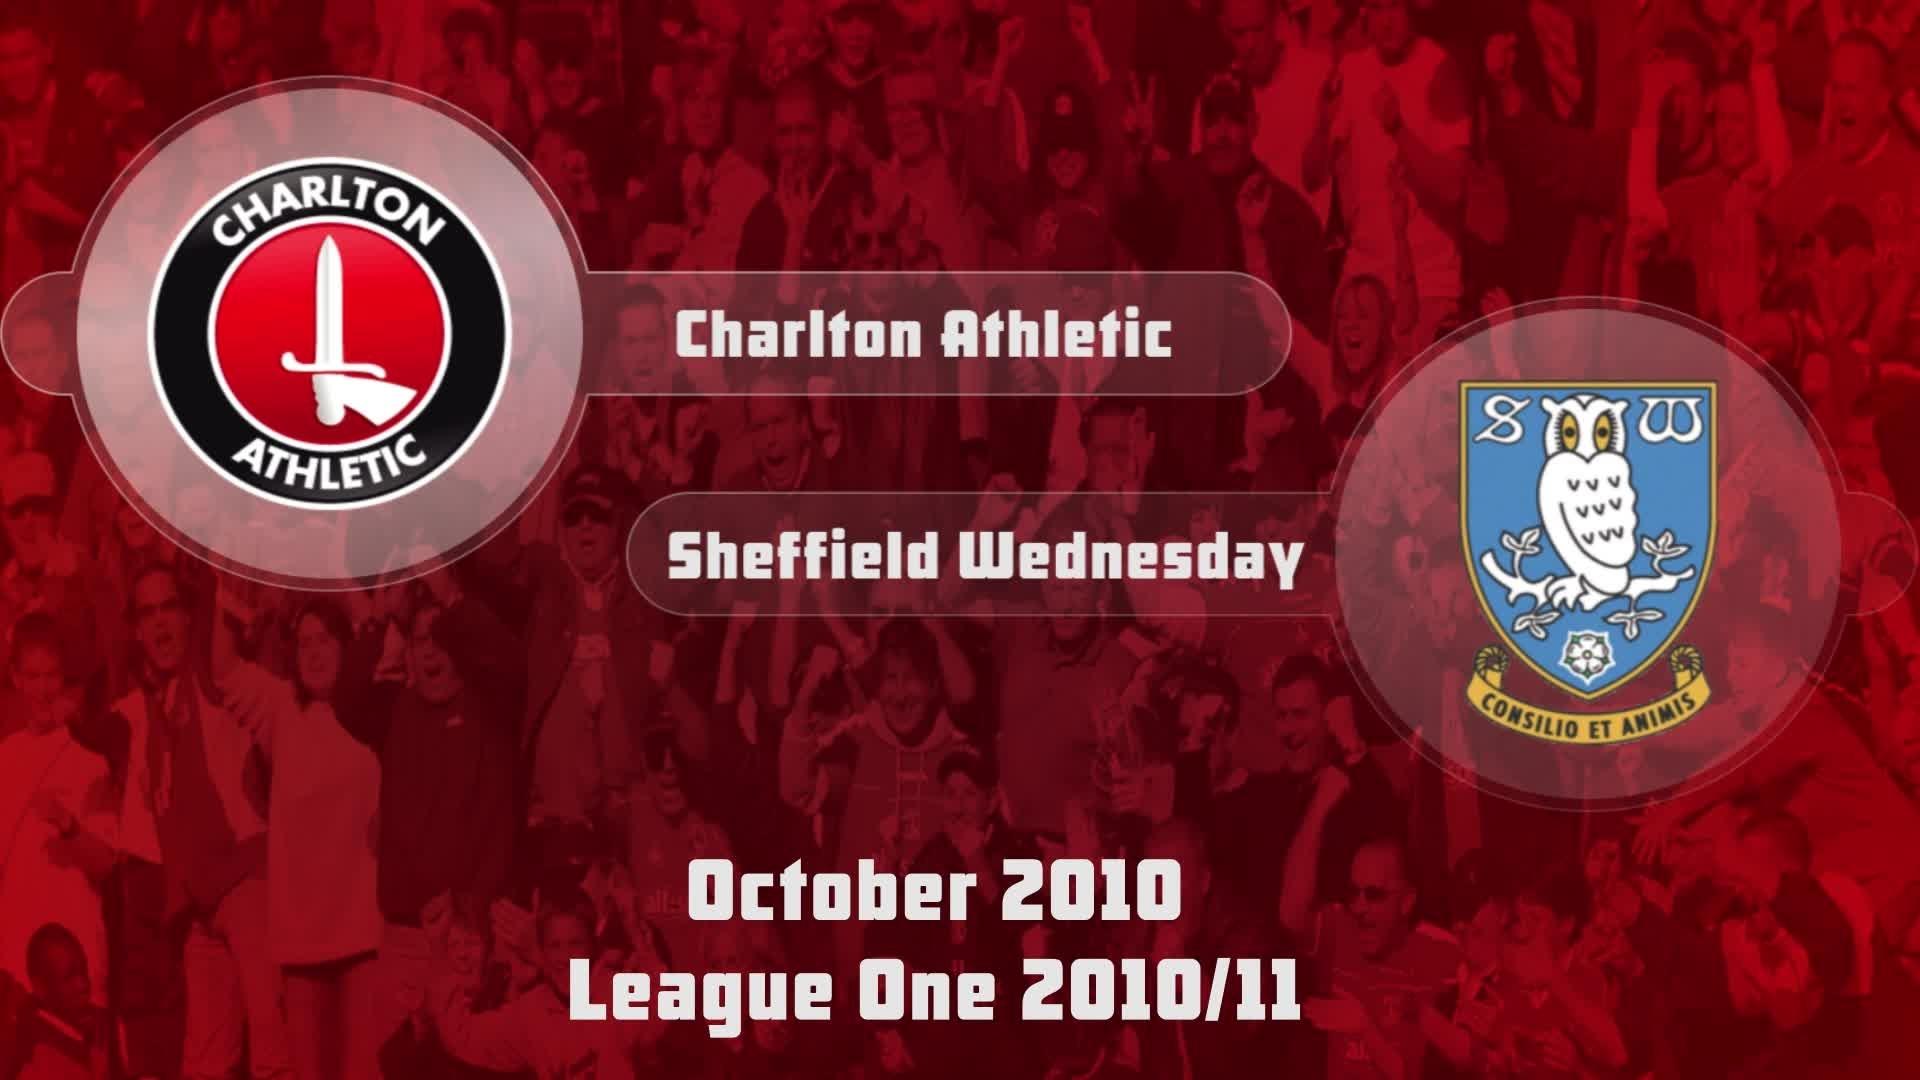 17 HIGHLIGHTS | Charlton 1 Sheffield Wednesday 0 (Oct 2010)